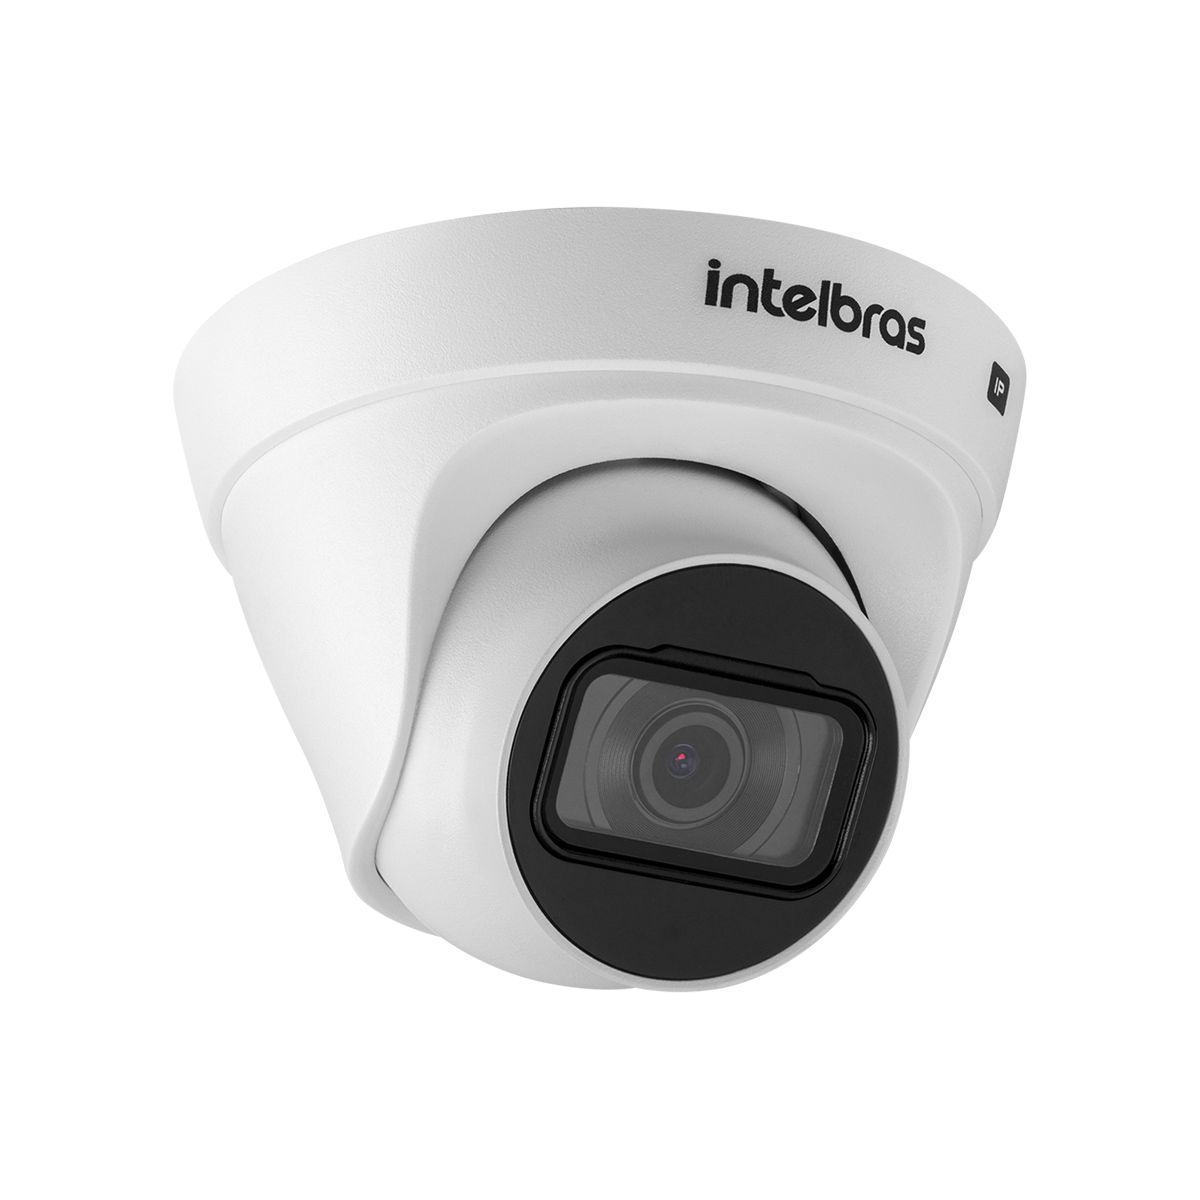 Câmera Intelbras Dome Onvif IP VIP 1020 D (1.0MP | 720p | 2.6mm | Plast)  - CFTV Clube | Brasil